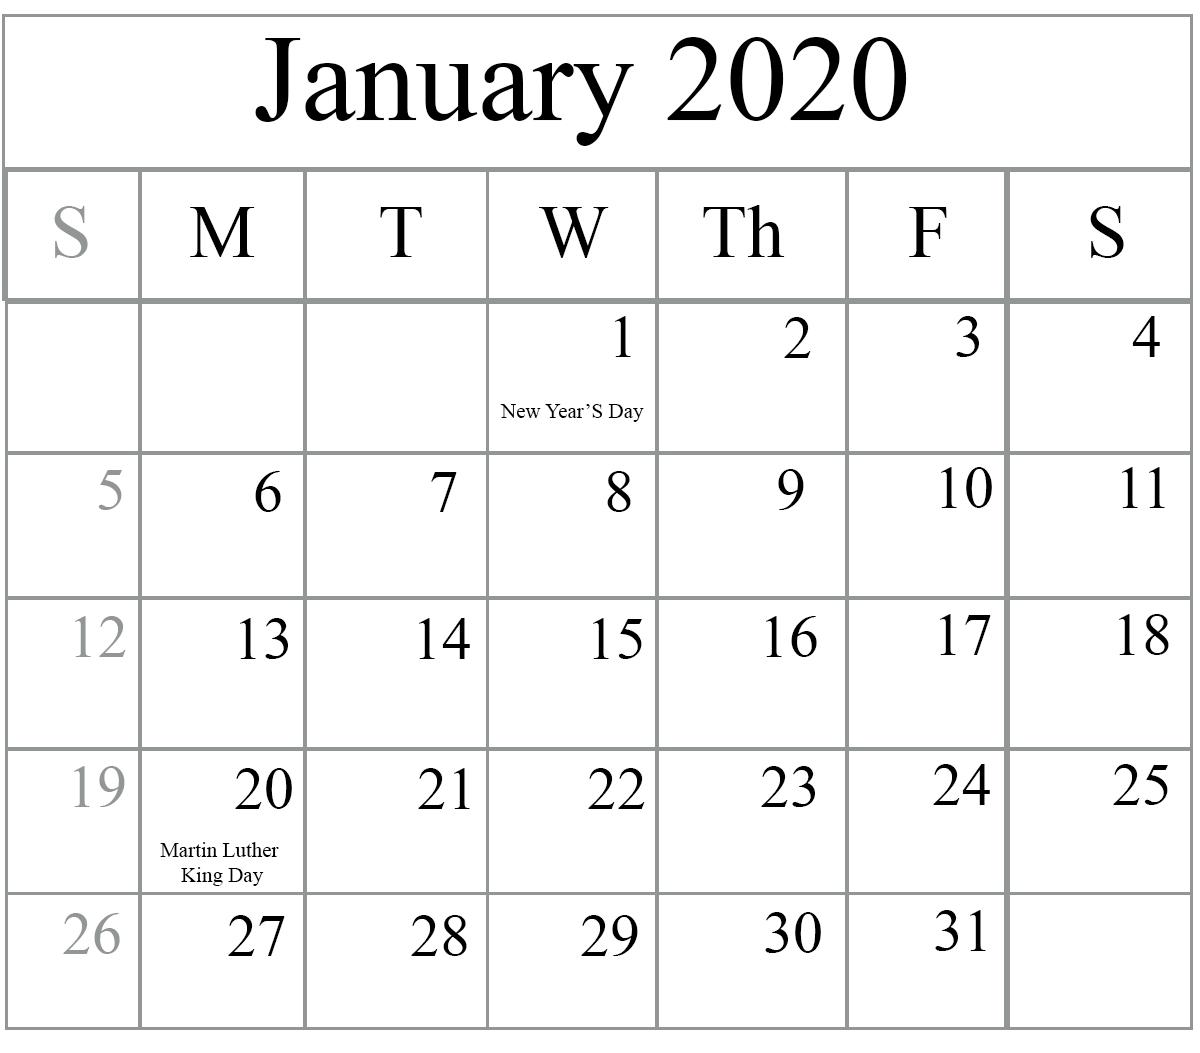 Free January 2020 Printable Calendar In Pdf, Excel & Word-Free Printable January 2020 Calendar With Holidays